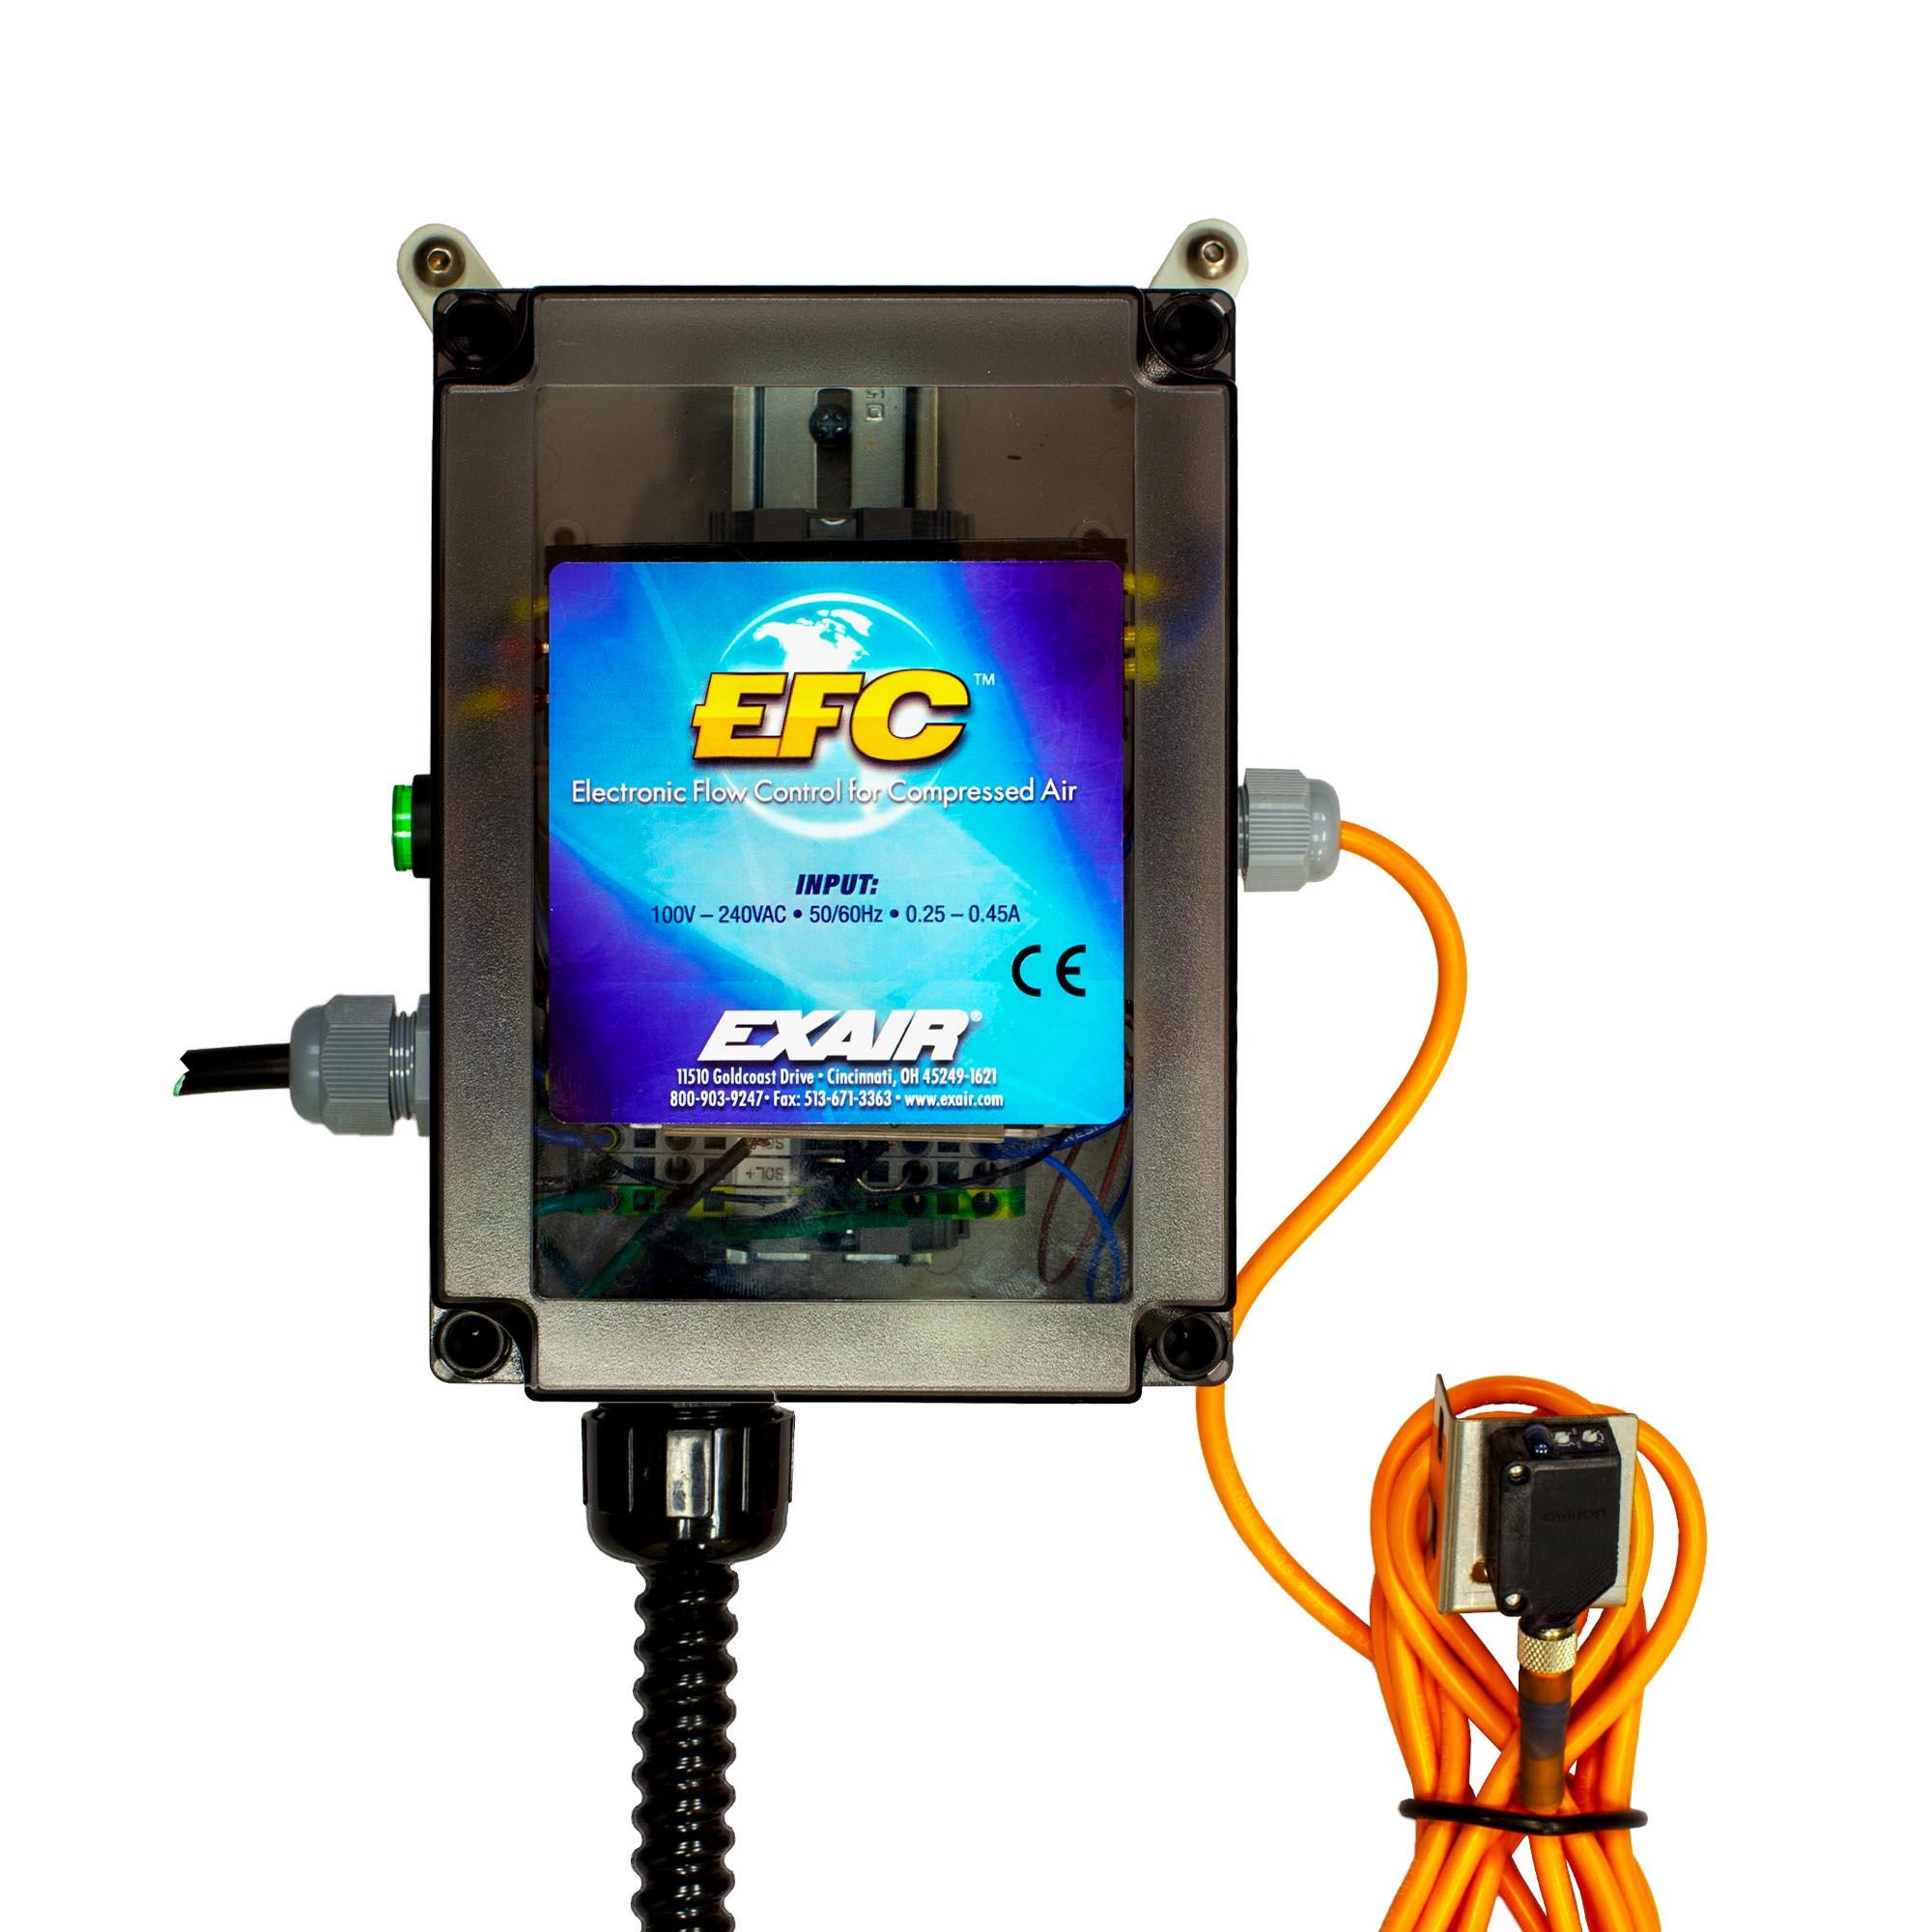 Model 9055 40 SCFM Electronic Flow Control